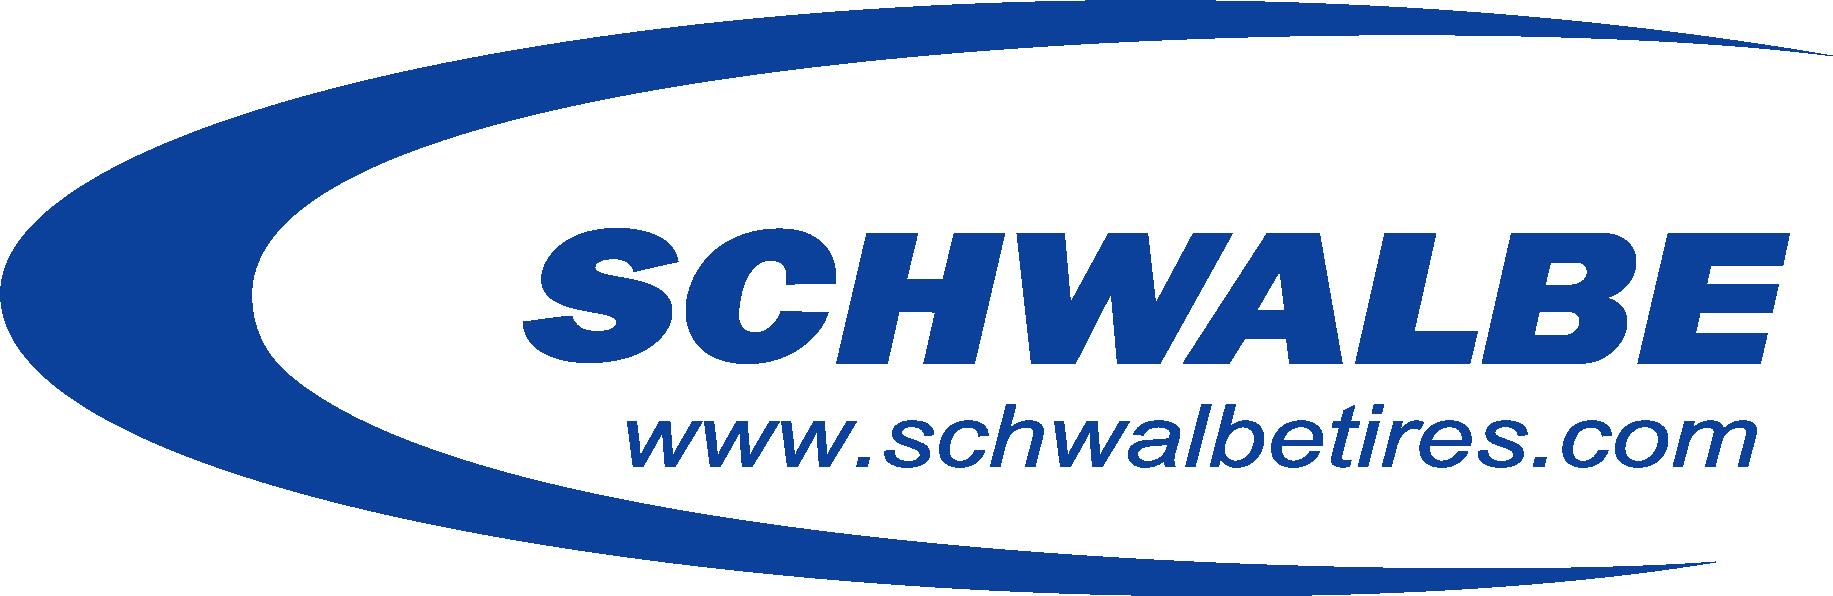 Schwalbe North America